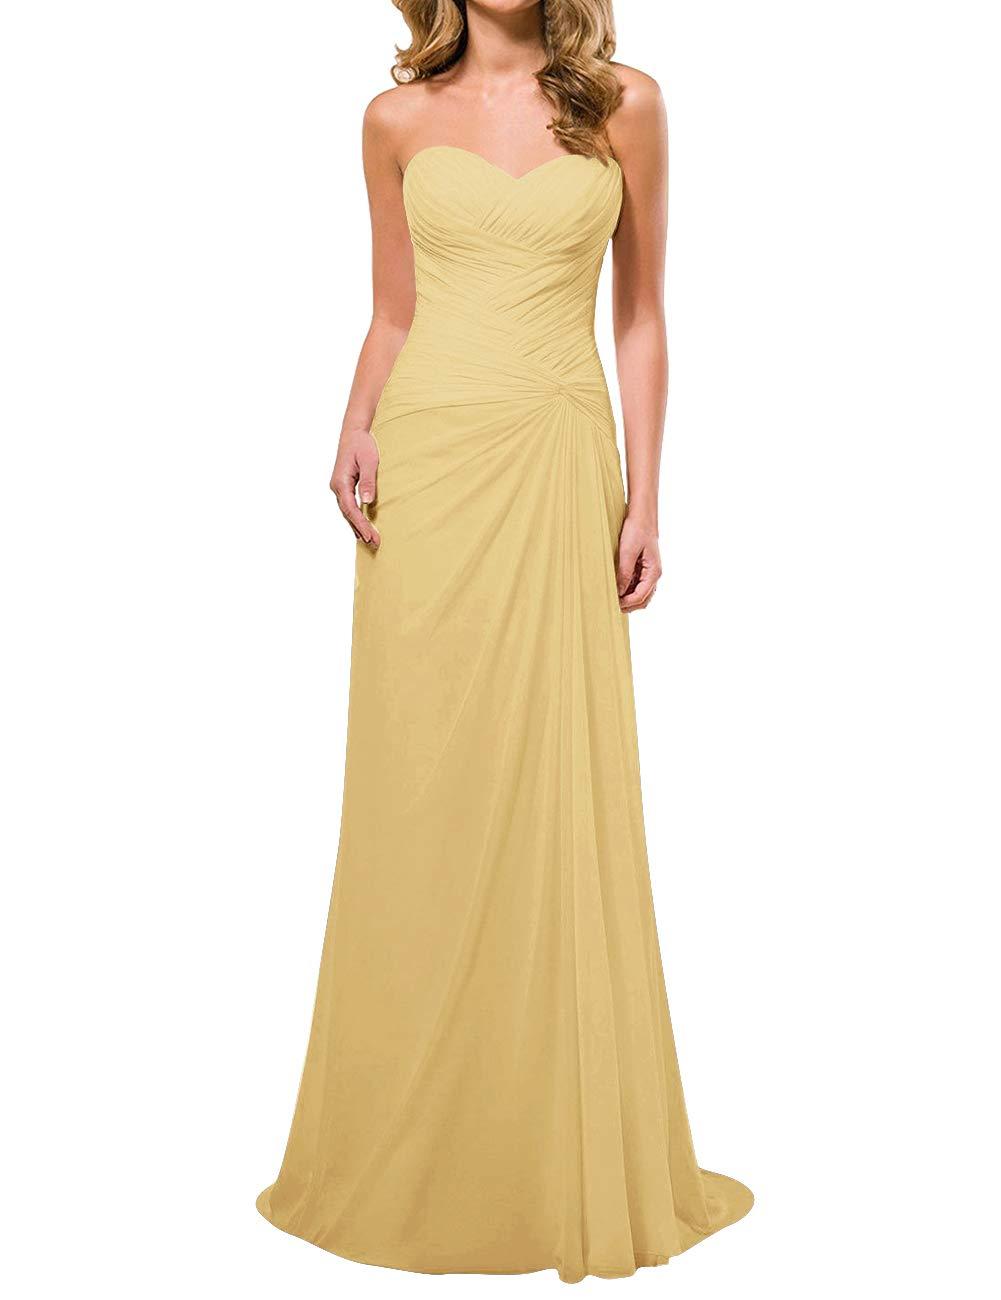 H S D Wedding Dresses Beach Bridal Dresses Pleated Bridal Gown Sweetheart Long Chiffon,Plus Size Designer Wedding Dress